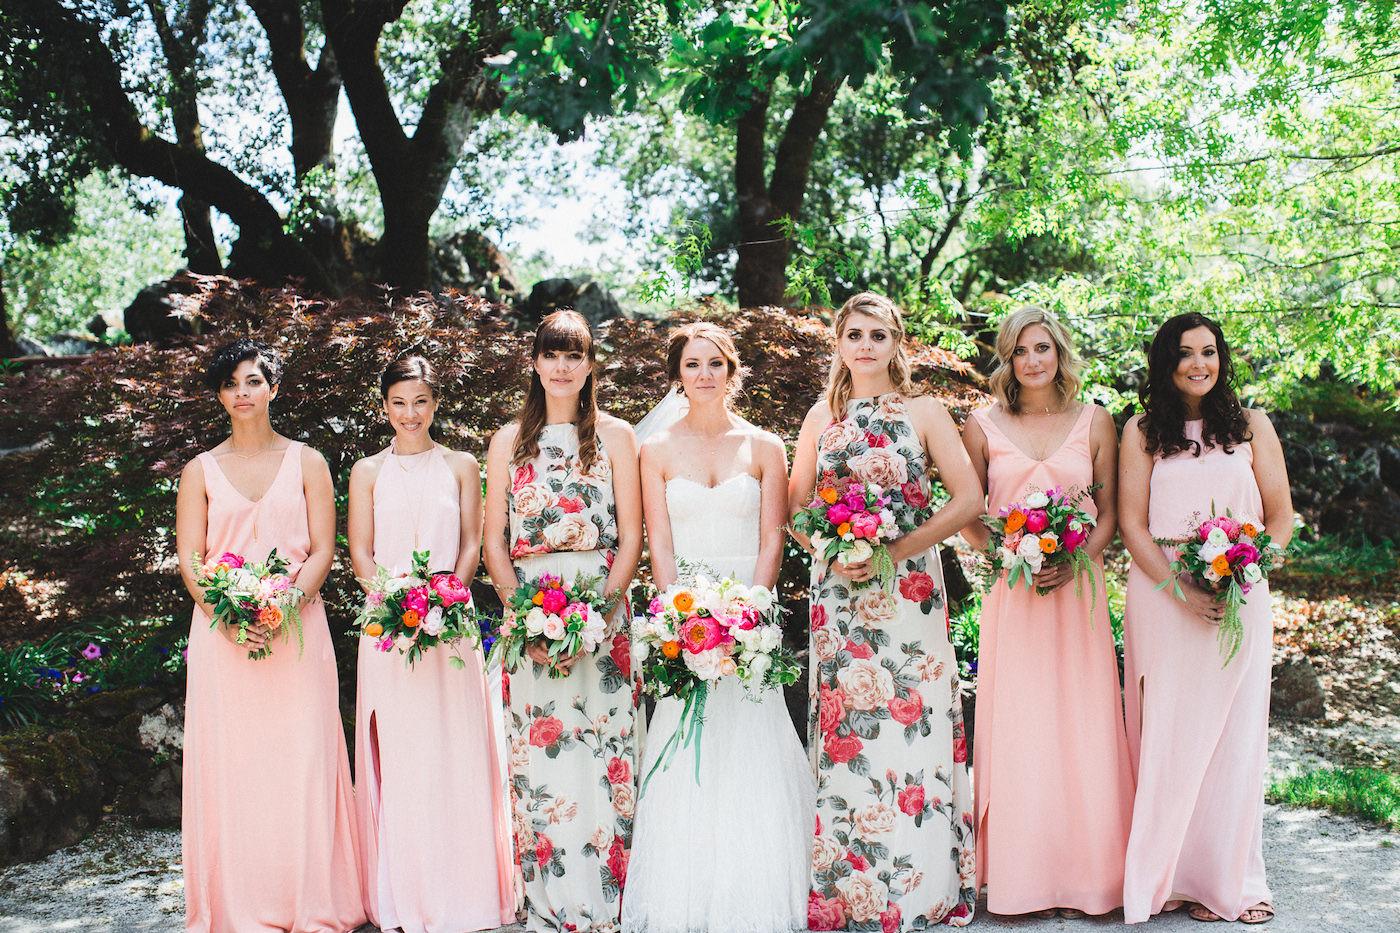 floral bridesmaid dresses - photo by Studio Castillero https://ruffledblog.com/vibrant-winery-wedding-in-california